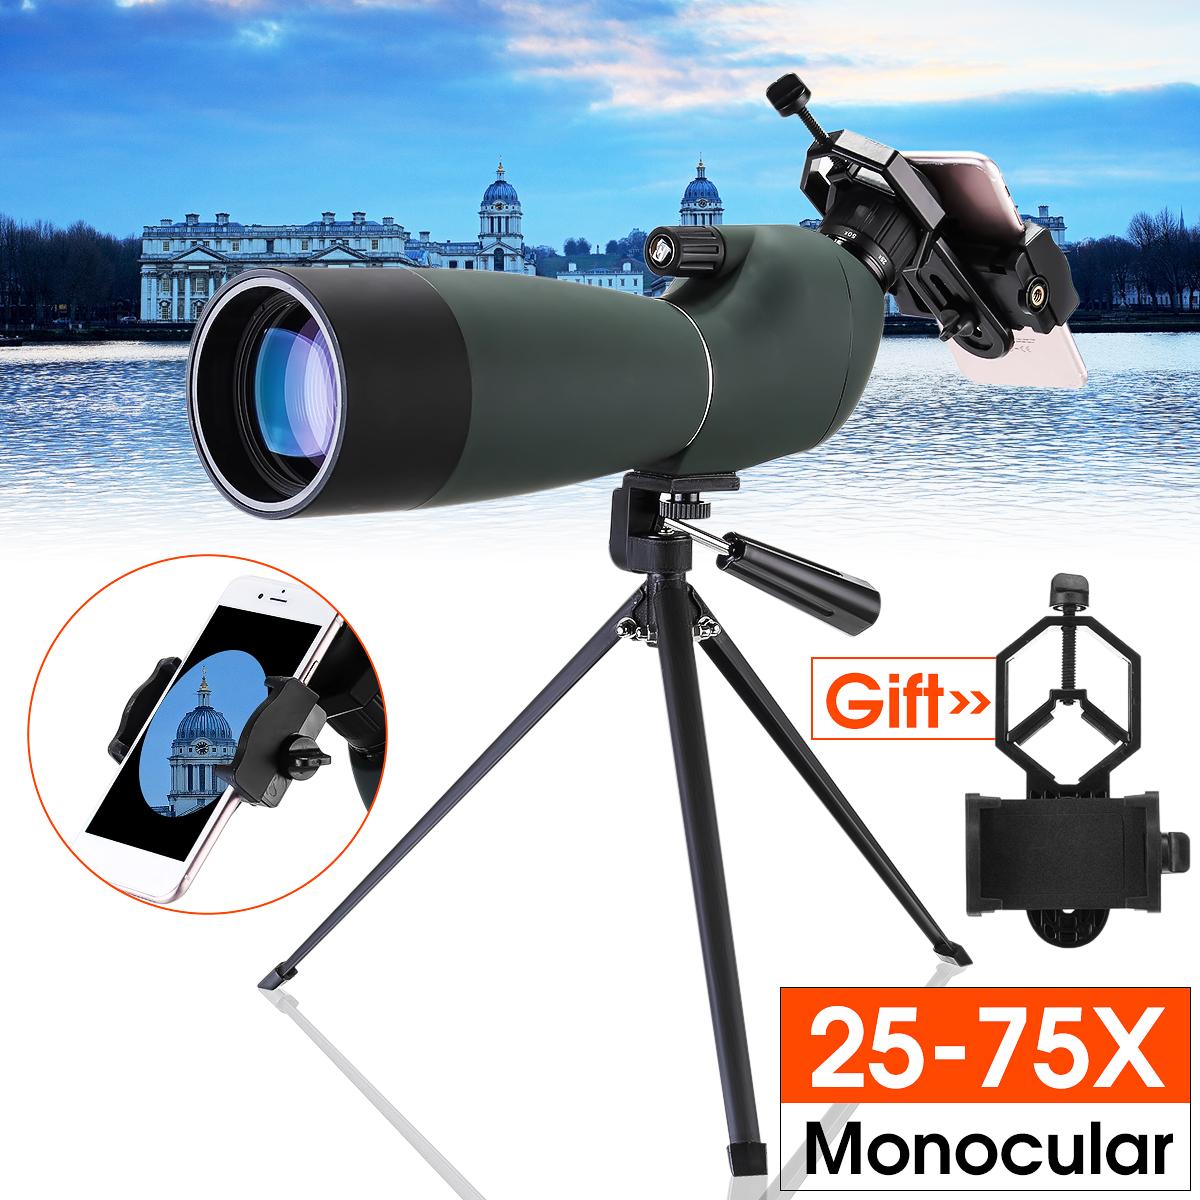 Day/Night Vision 25-75X70 Zoom HD Monocular Spotting Scope BAK4 Telescope with Tripod + Phone Adapter